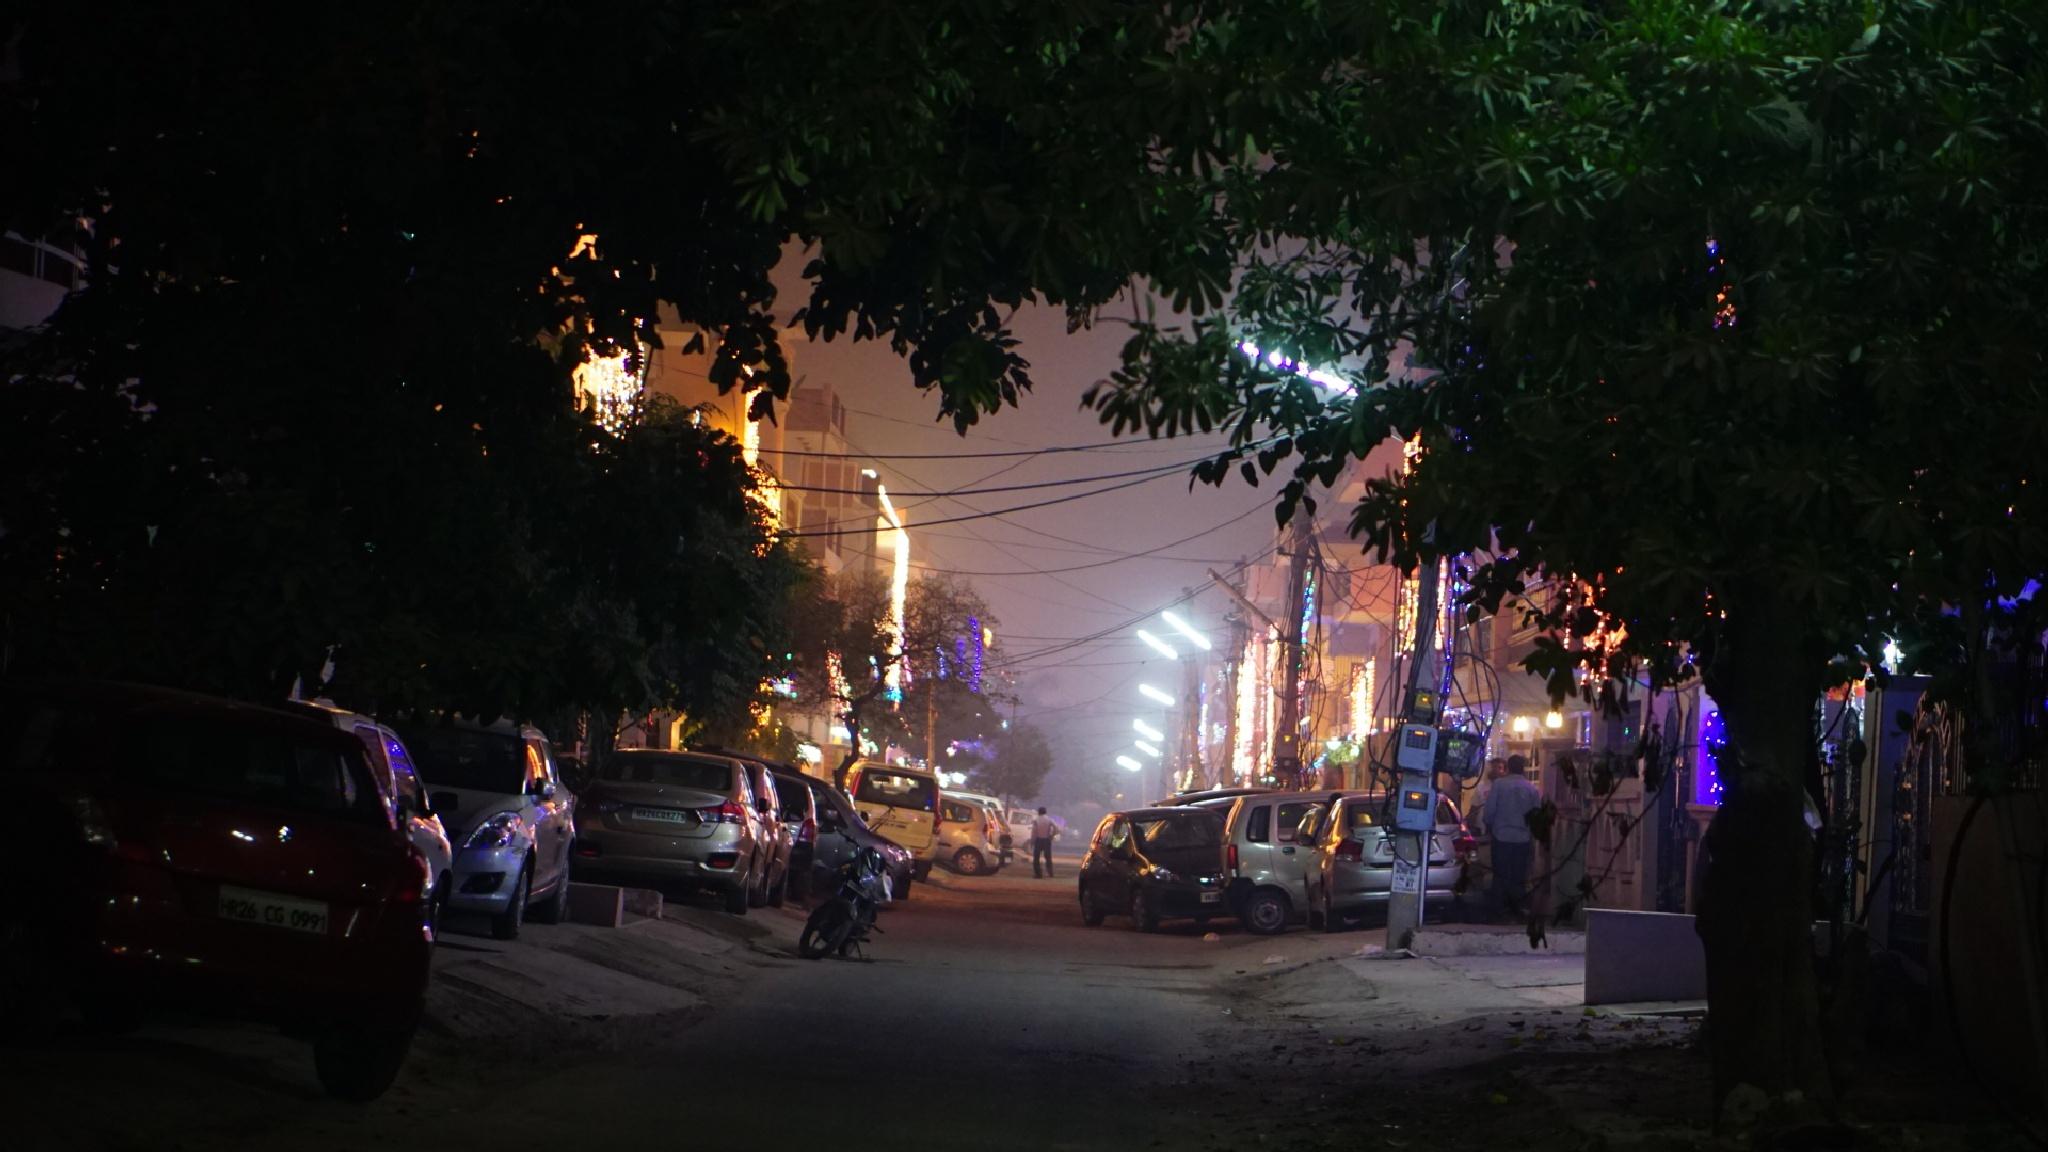 Street of India on diwali  by Nancy Kant